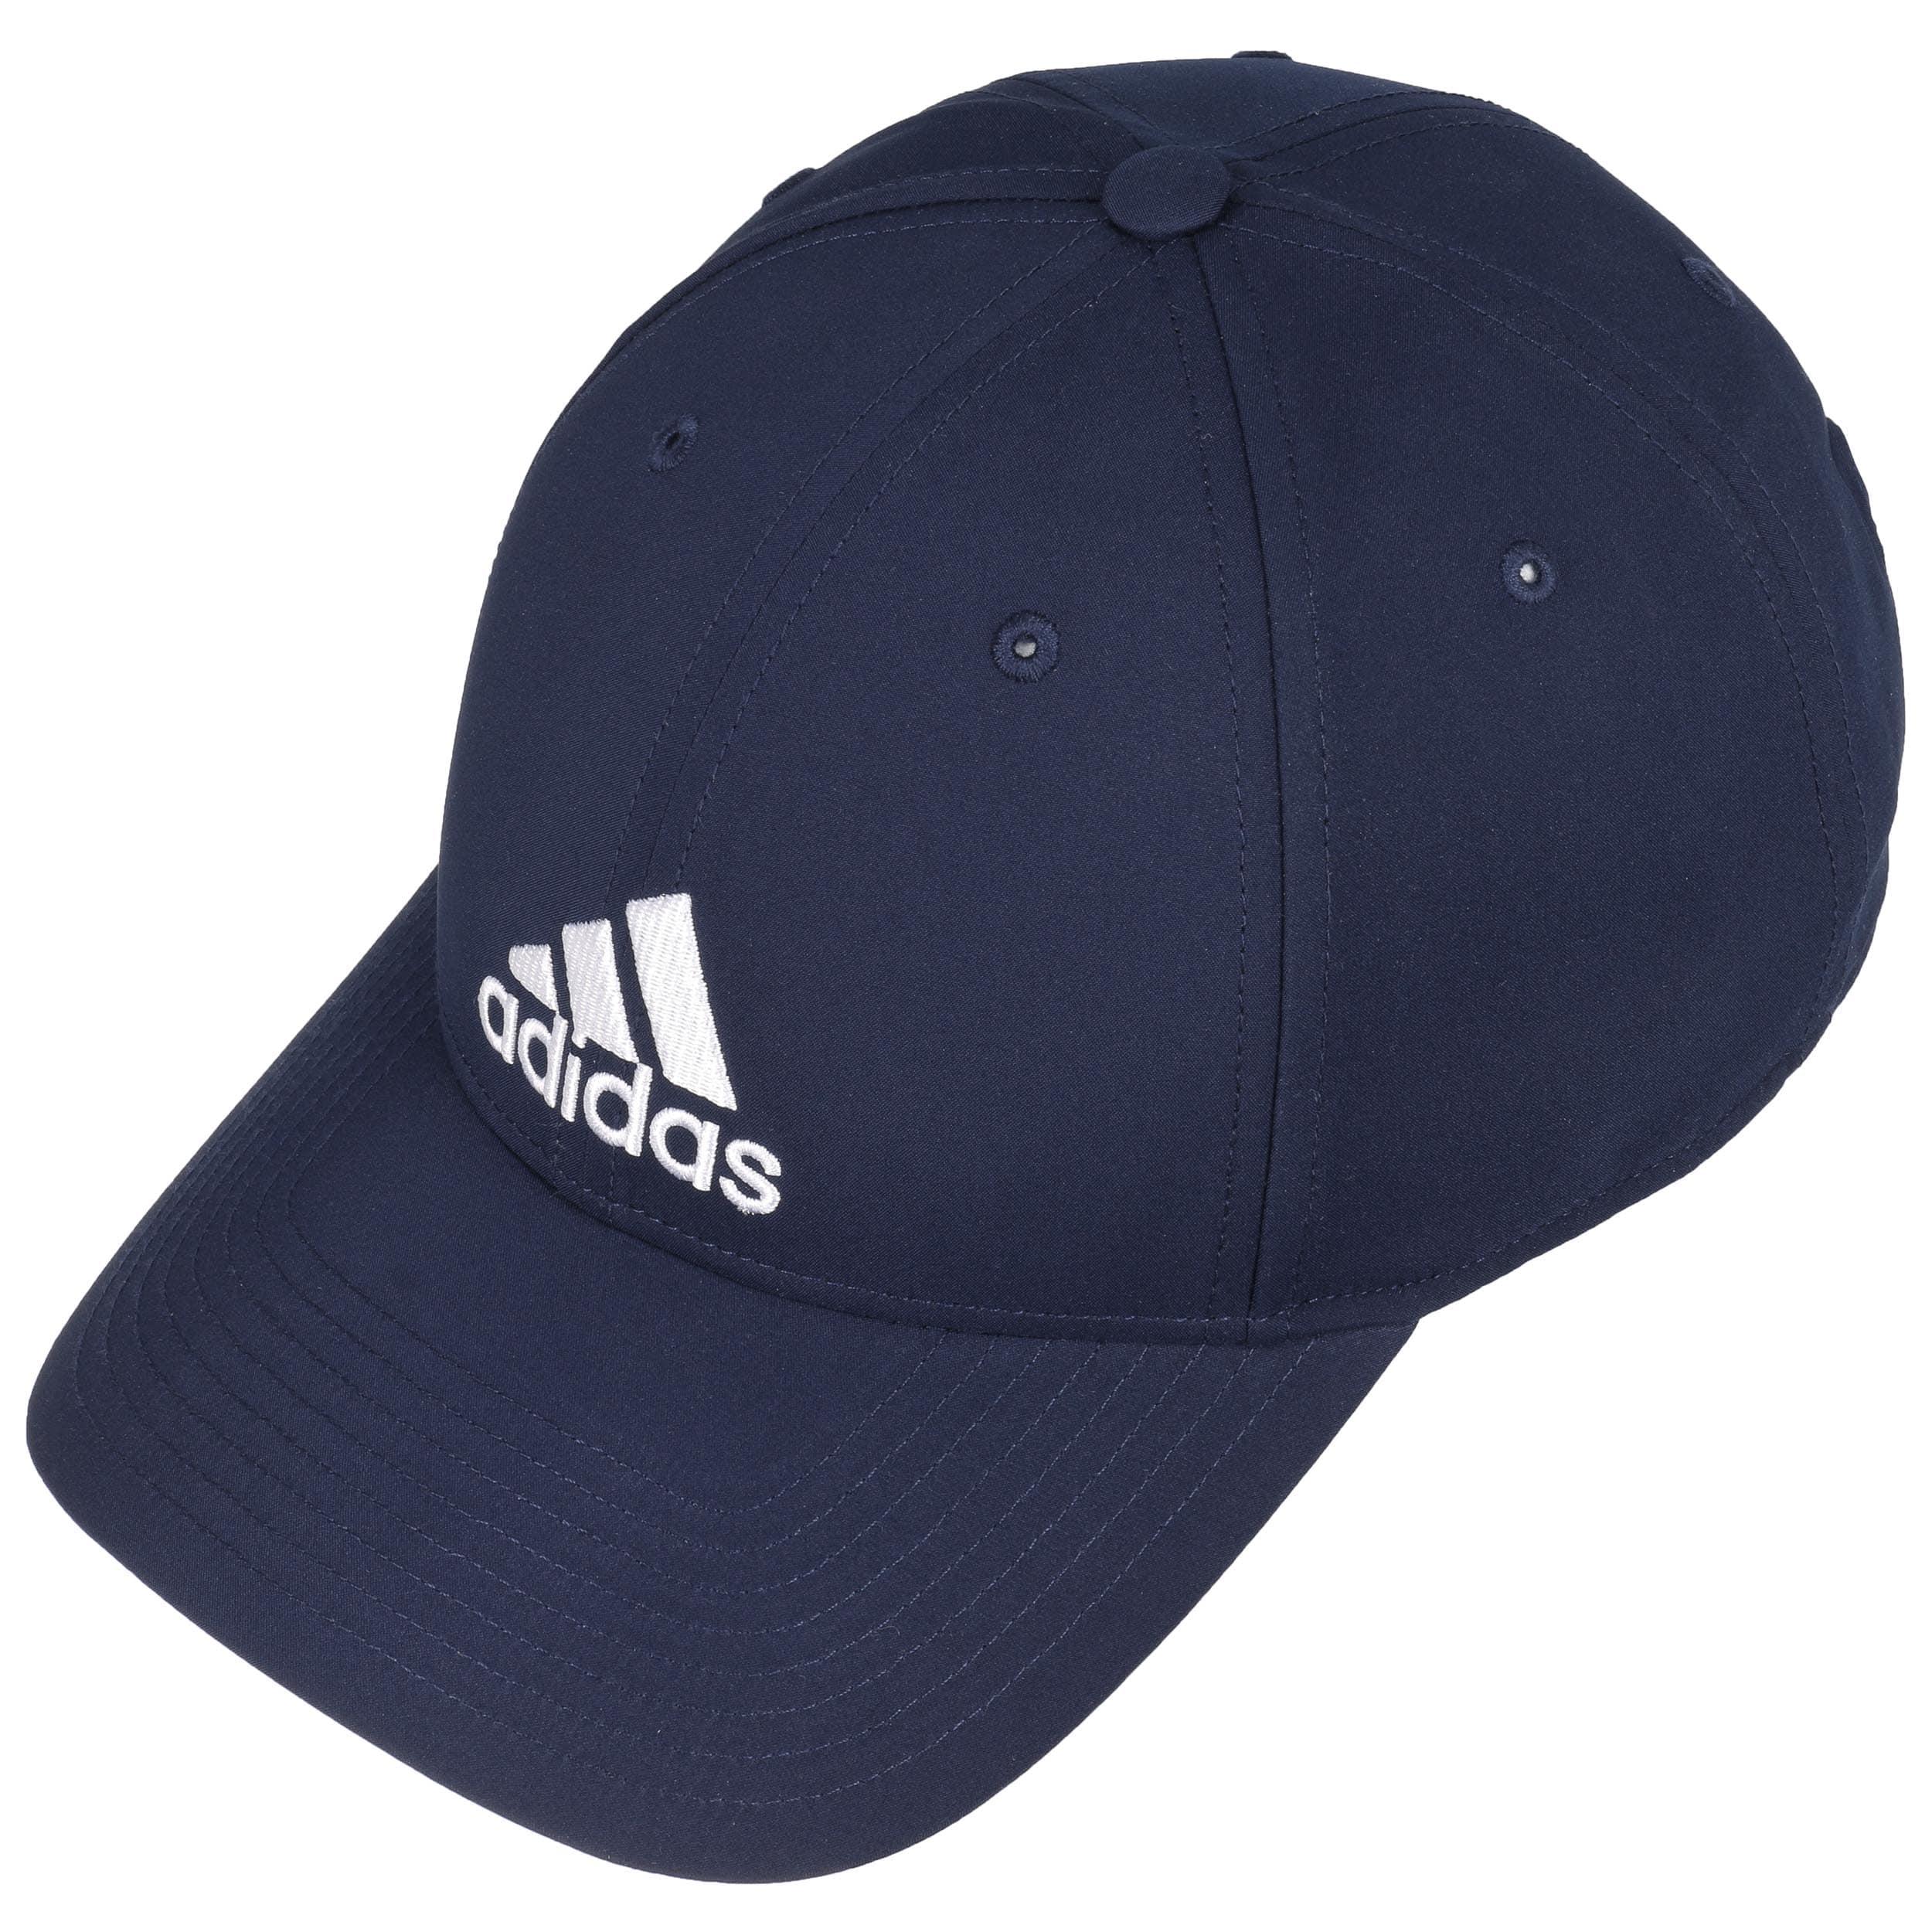 adidas gorra azul invierno